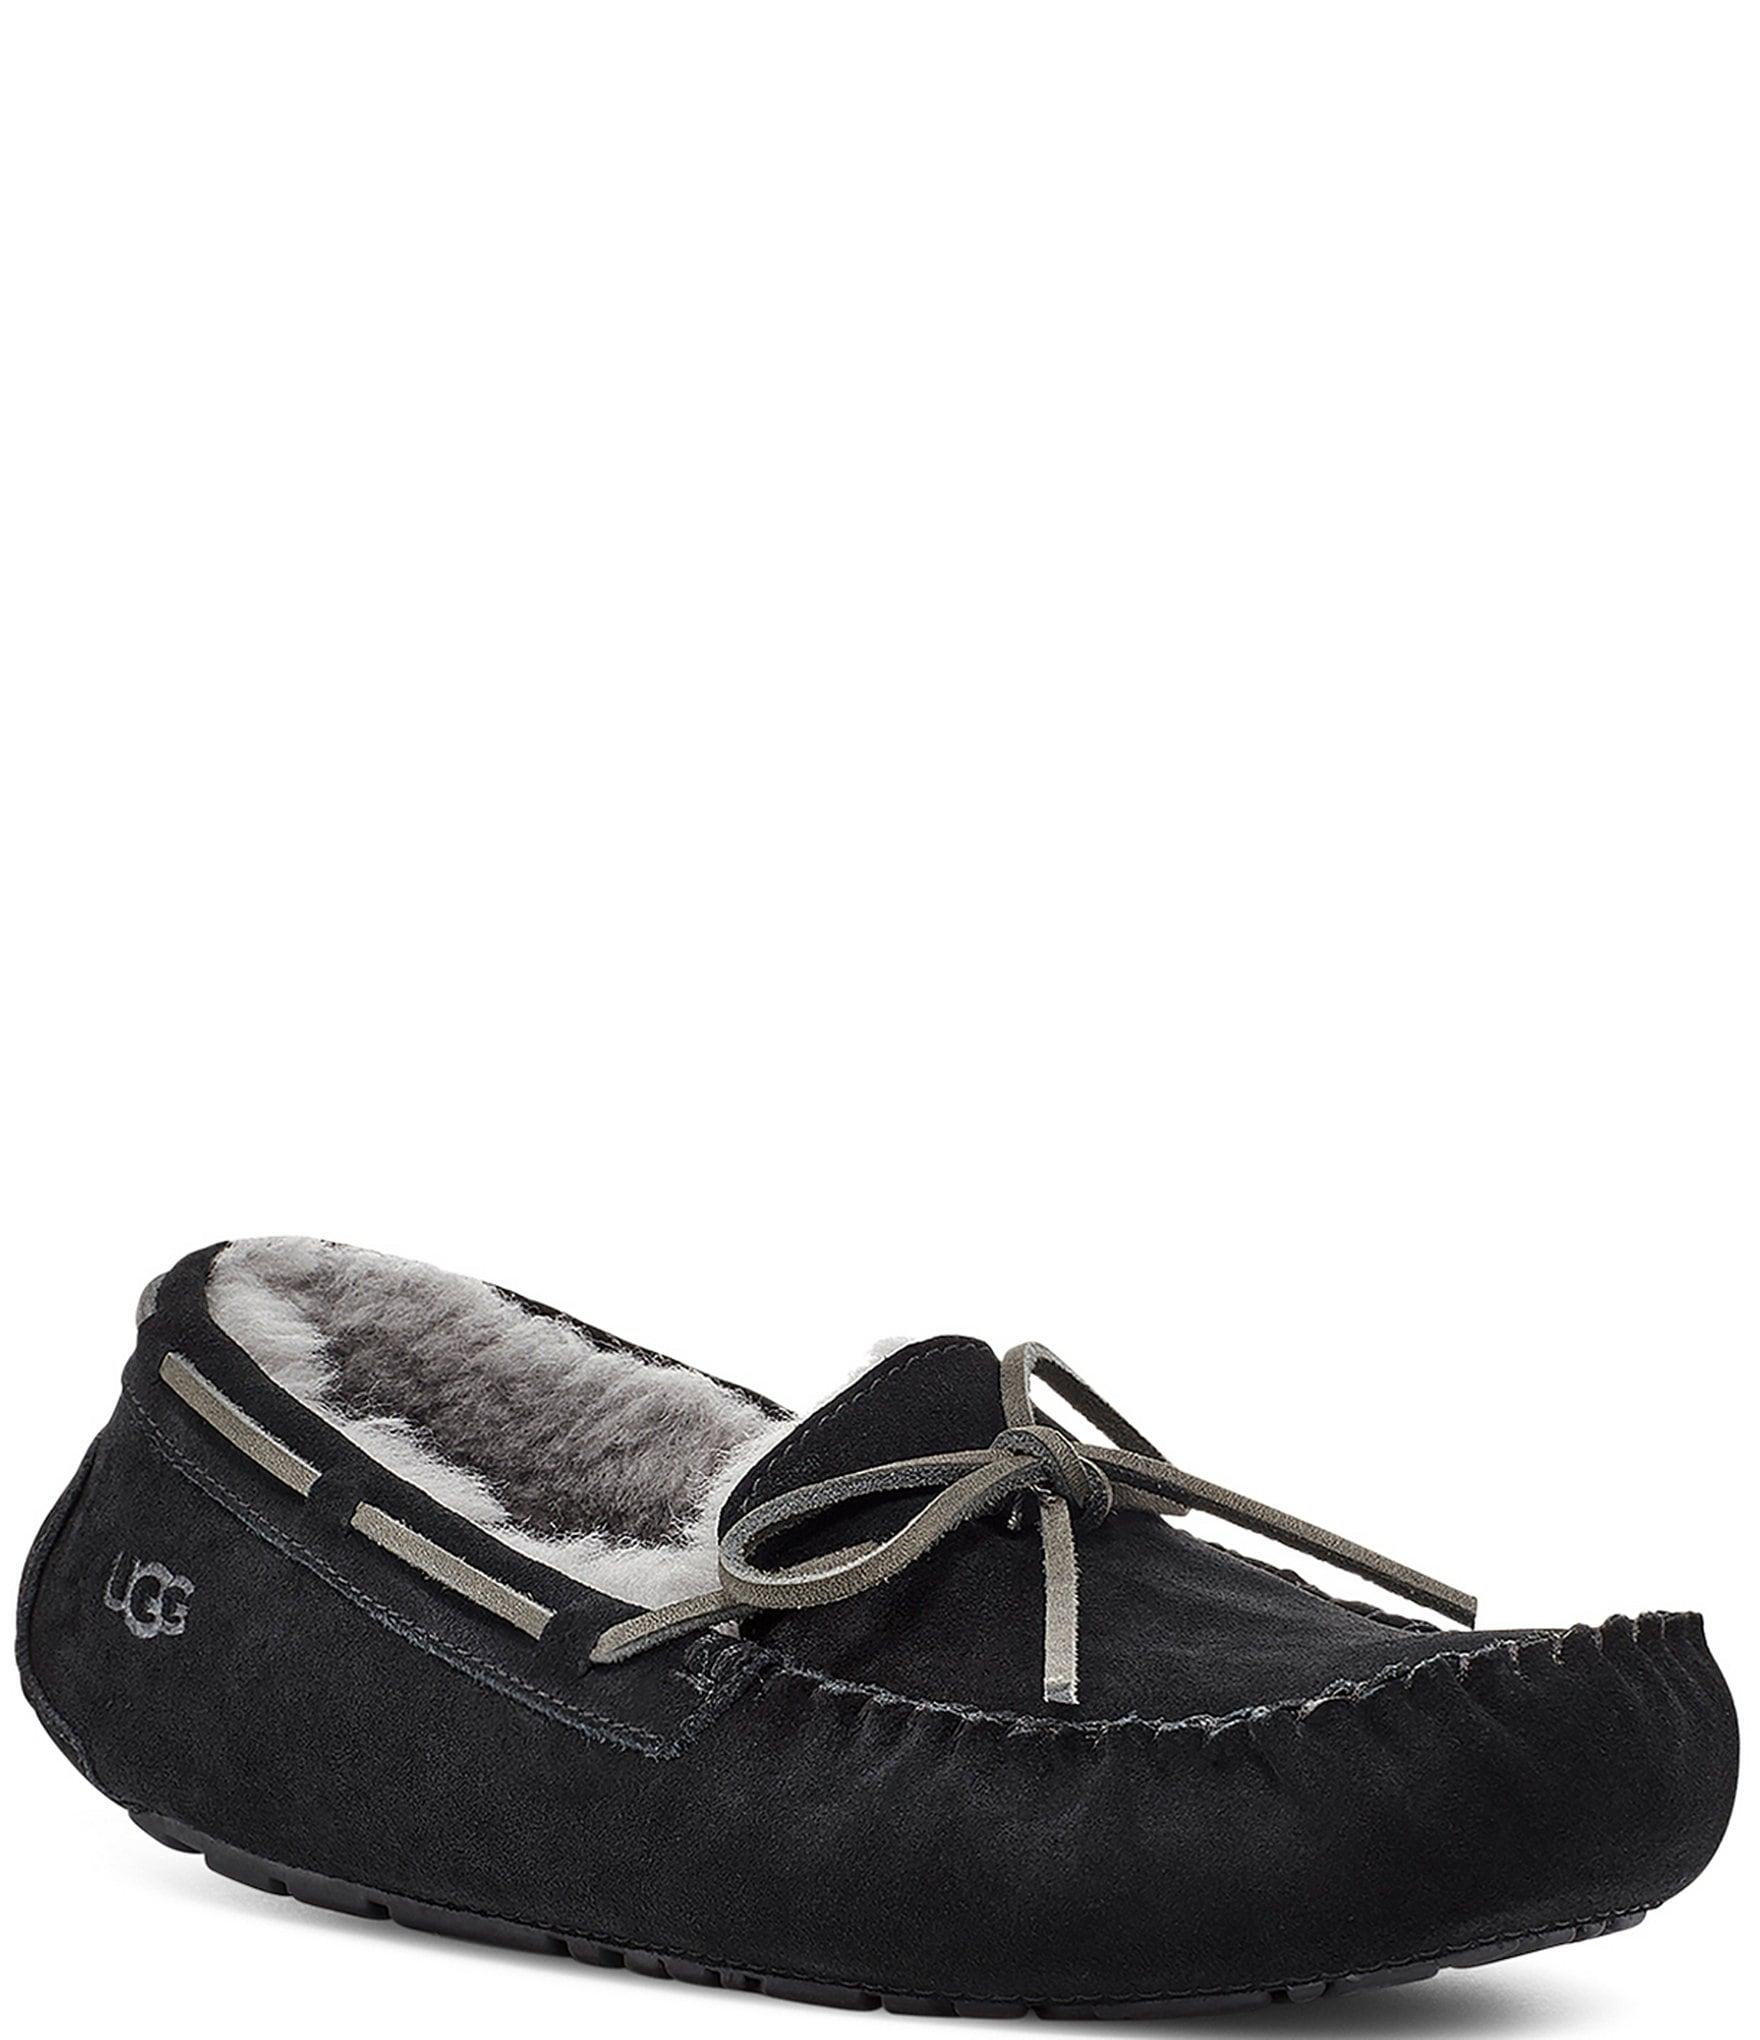 84c9280af5d ugg slippers  Shoes for Women